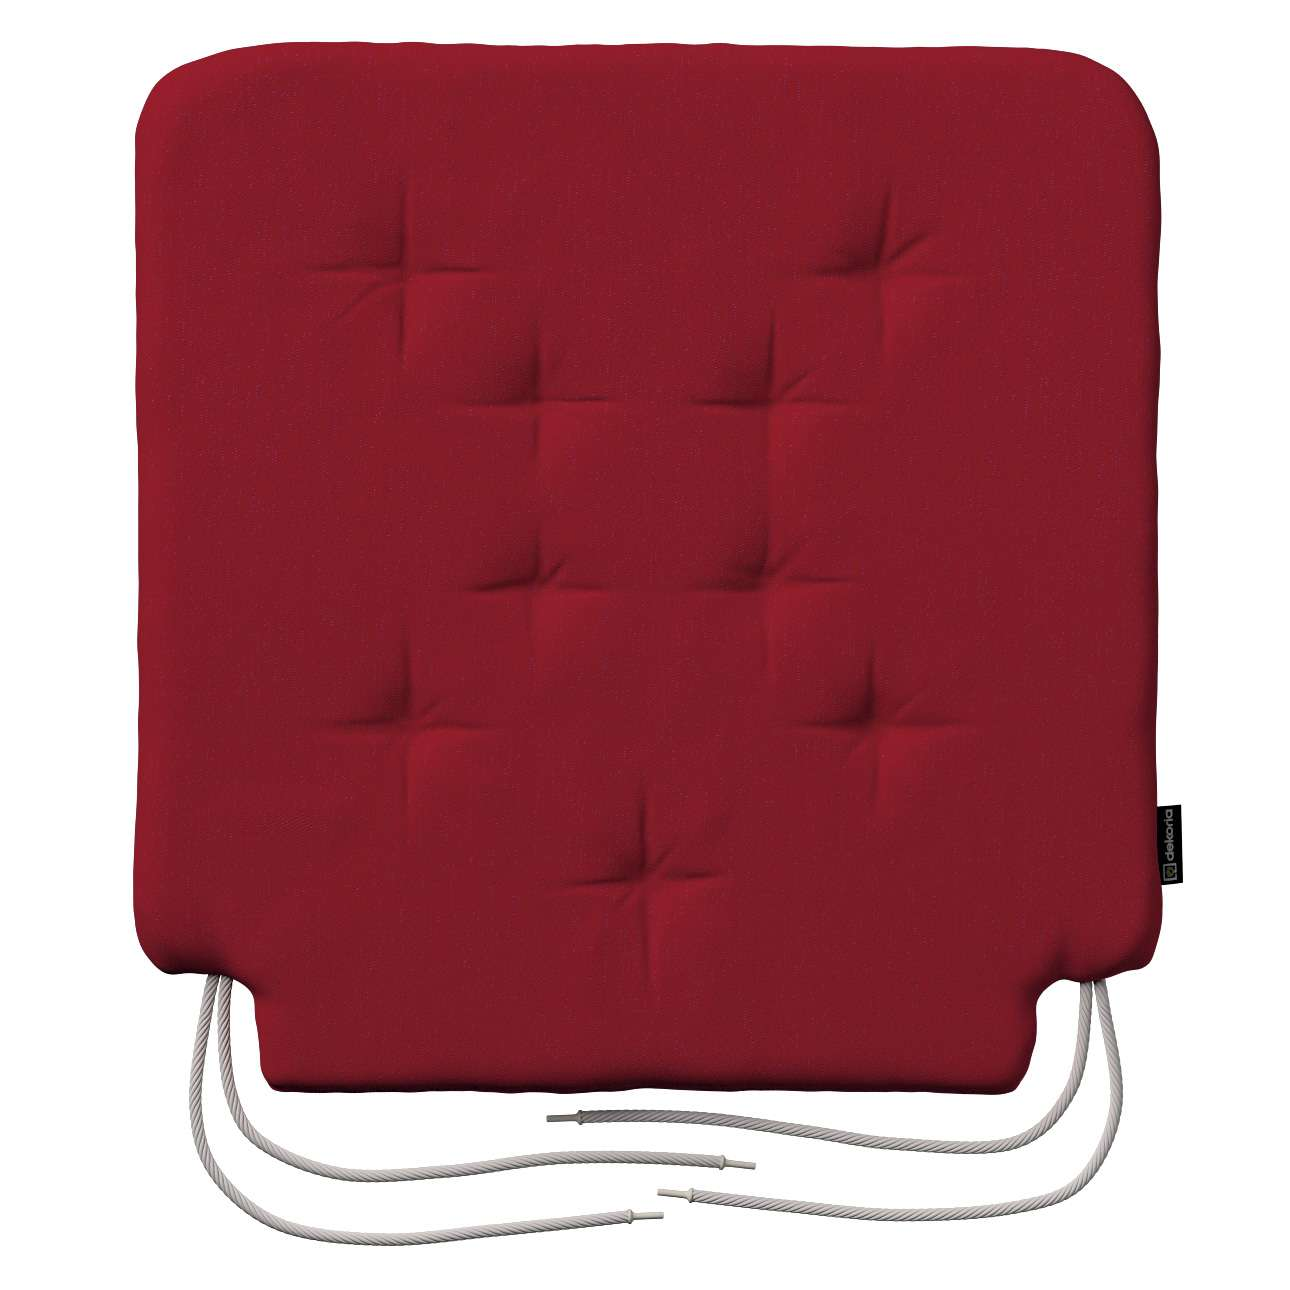 Kėdės pagalvėlė Olek  42 x 41 x 3,5 cm kolekcijoje Chenille, audinys: 702-24